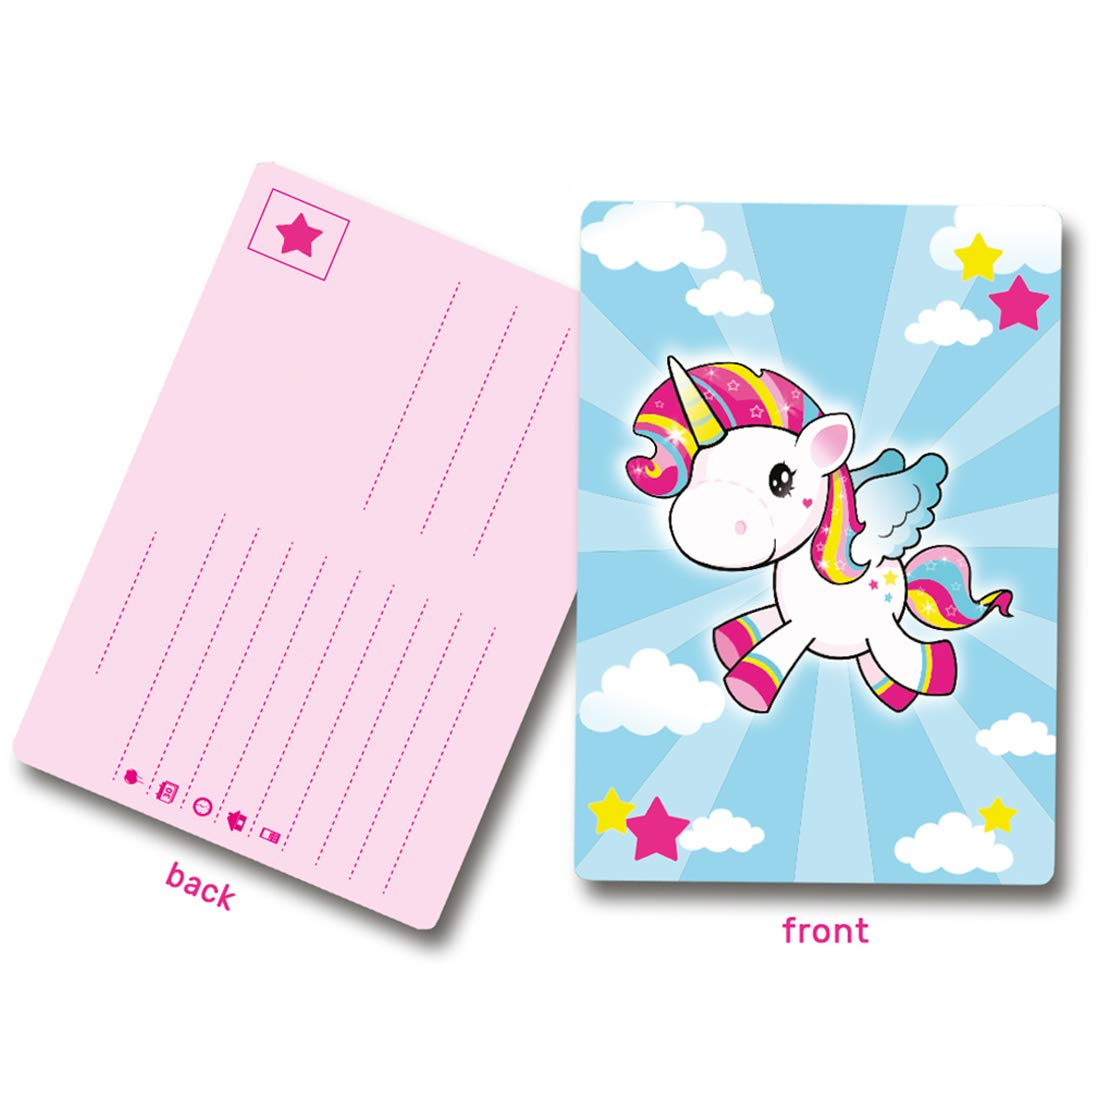 8 Invitaciones de cumpleaños unicornio / Aprox. 10 x 14 cm ...